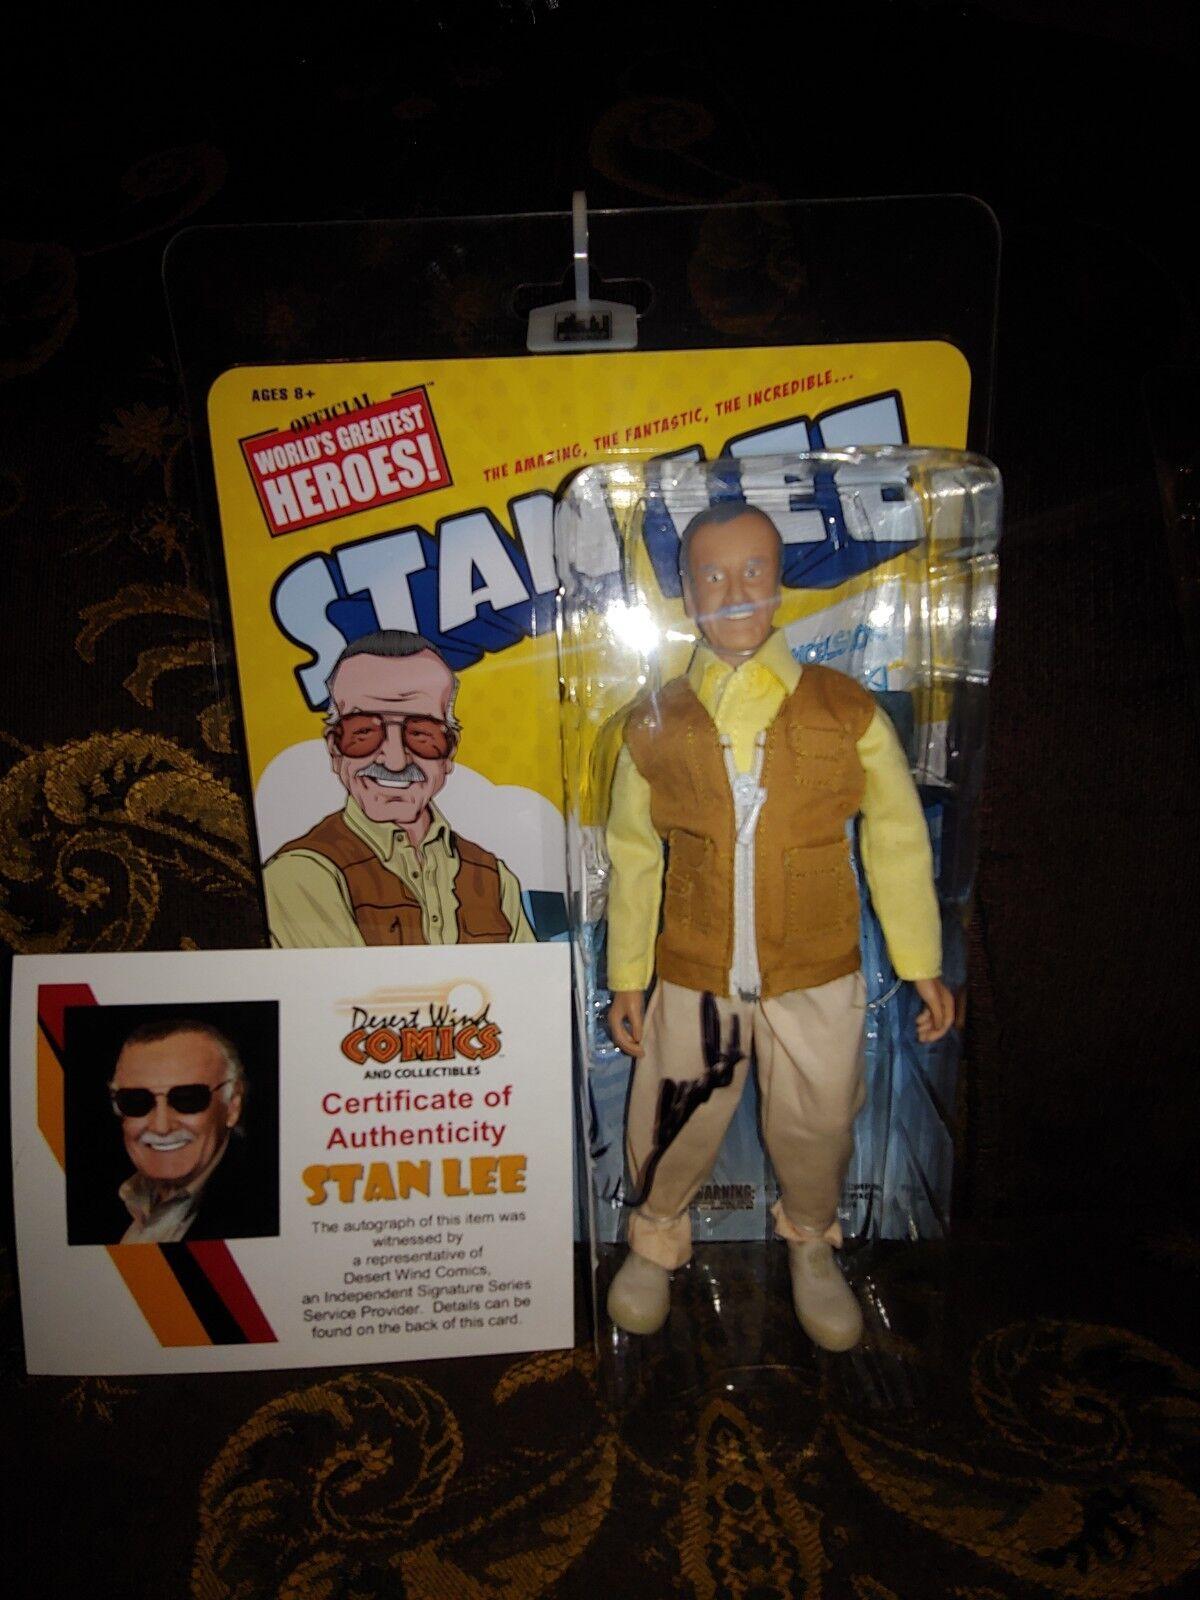 Stan Lee Retro 8 Inch Action Figure  [Autographed [Autographed [Autographed With COA] 42c4a2